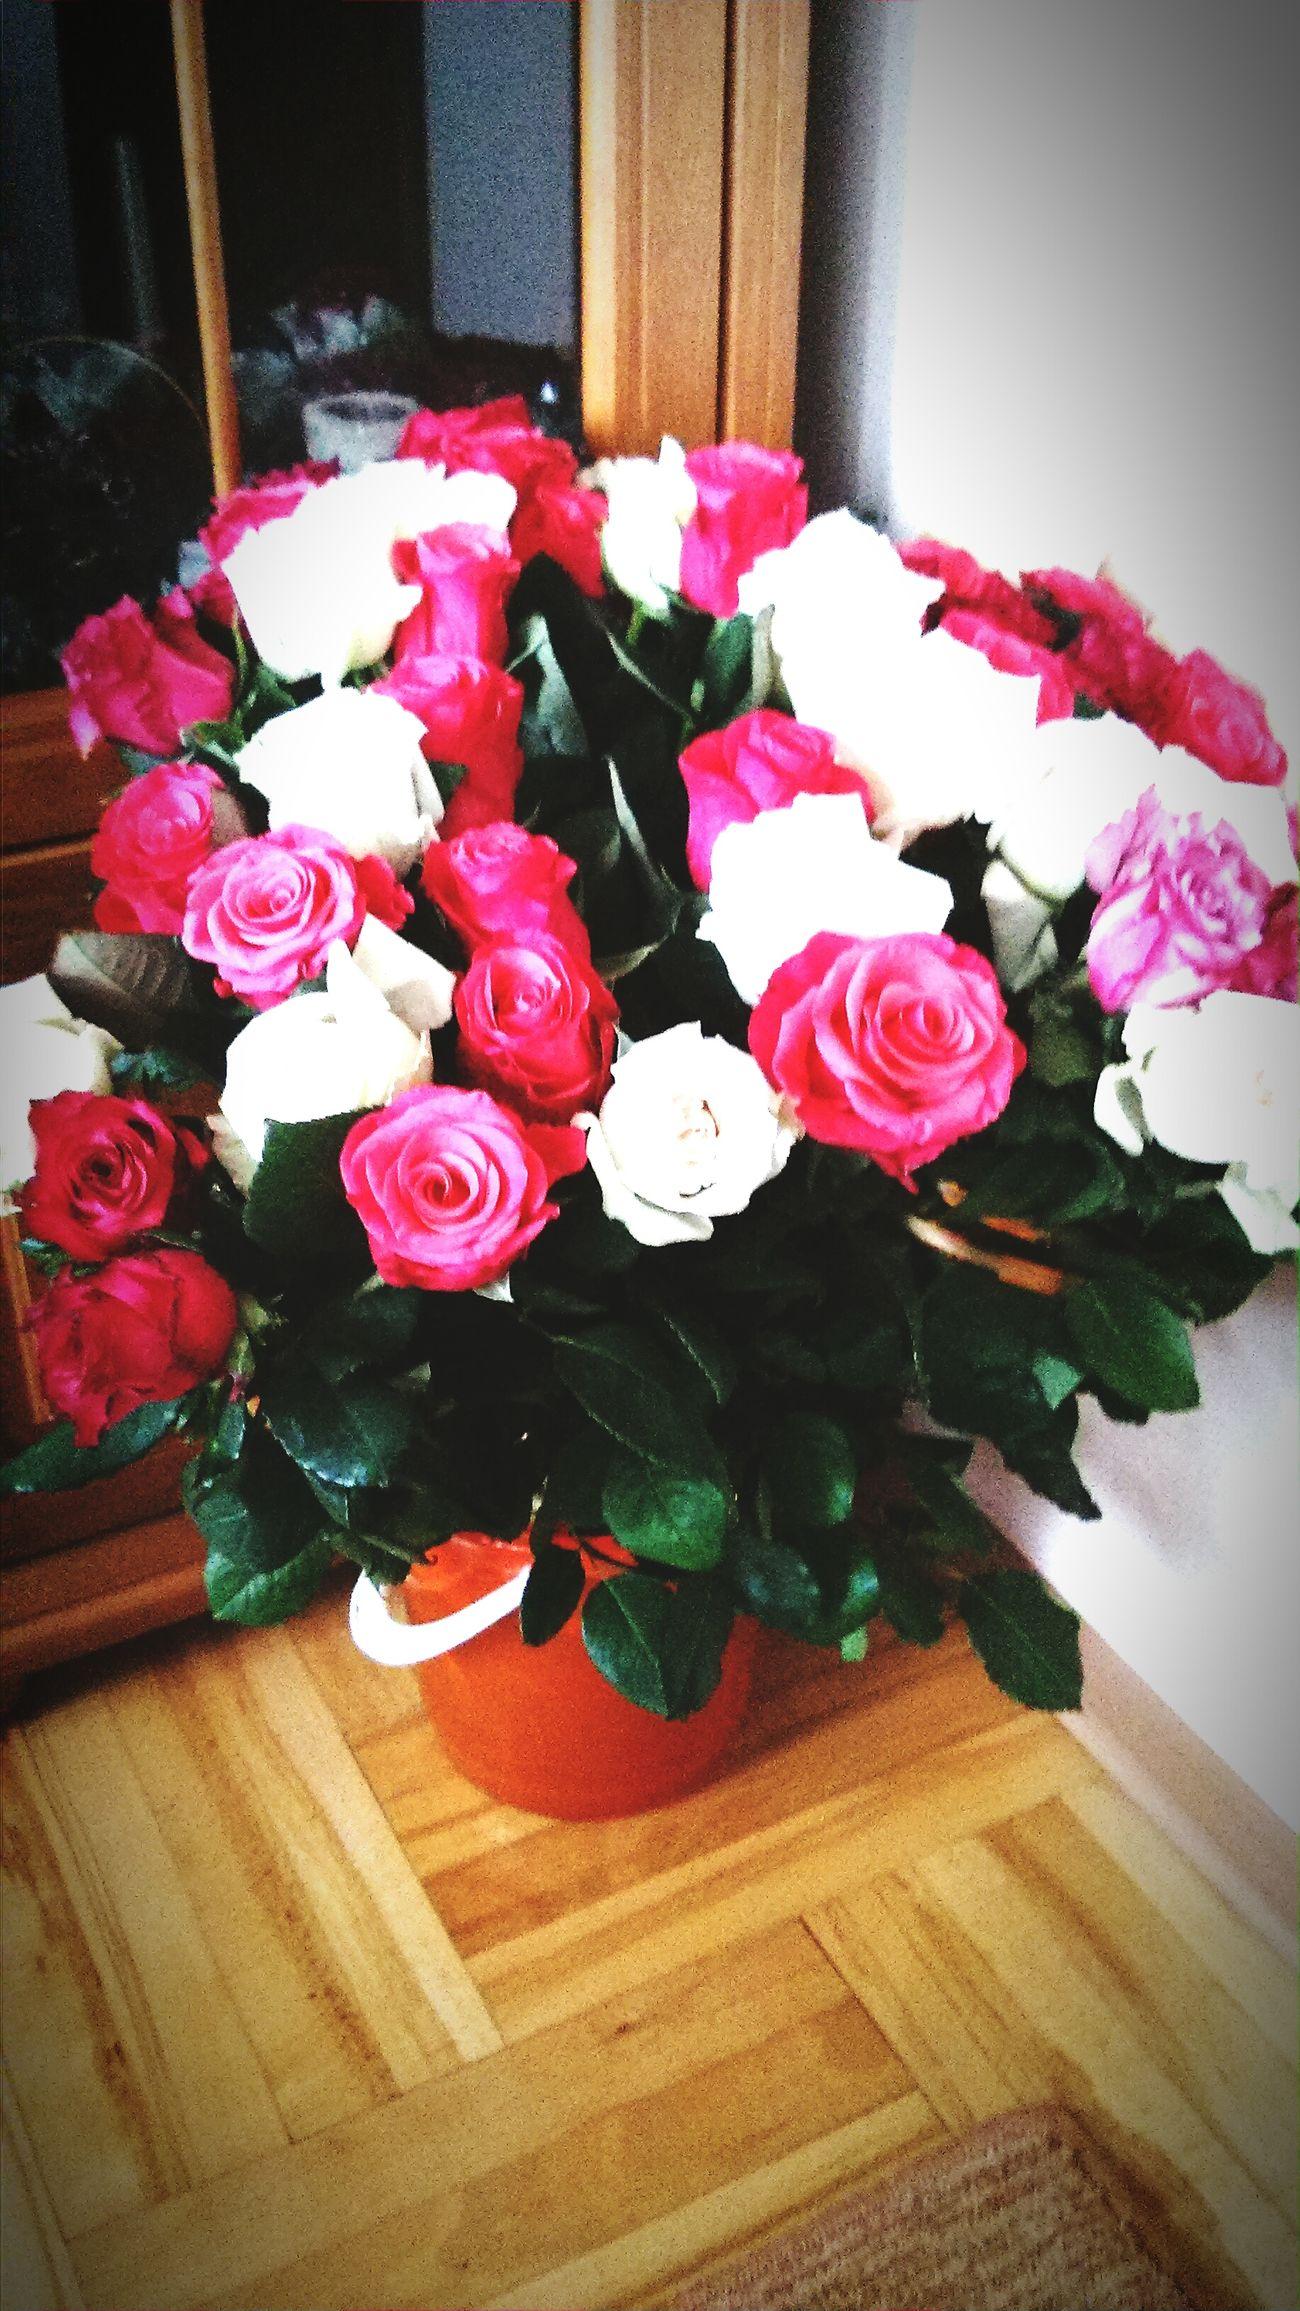 Roses🌹 Flowers Rose♥ 60rose NiceDay❤️❤️ ❤️💜💙💚💛 Springtime